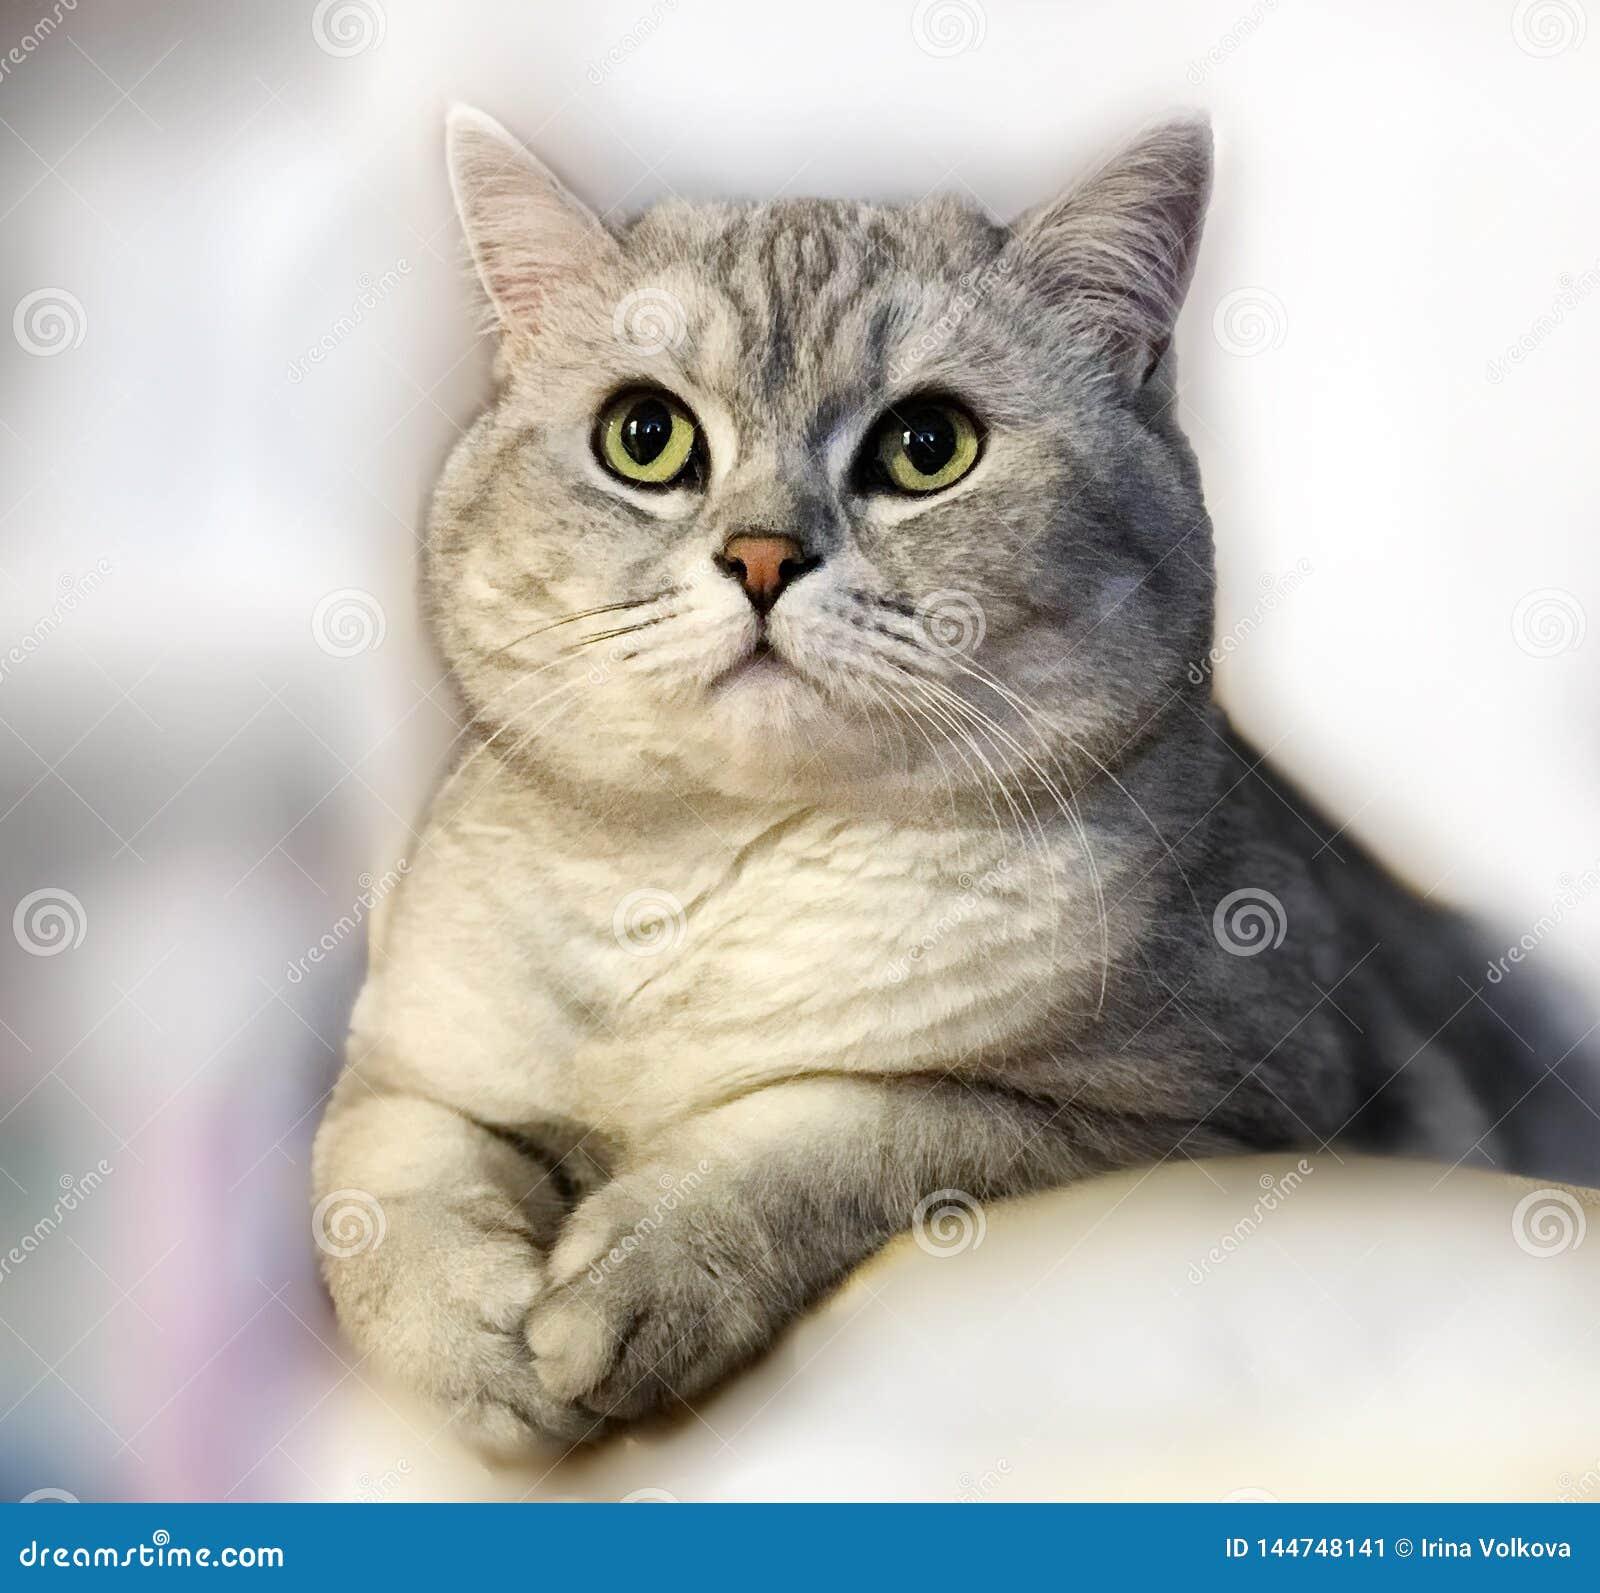 Cute Cat Grey British kitten on Light funny animals